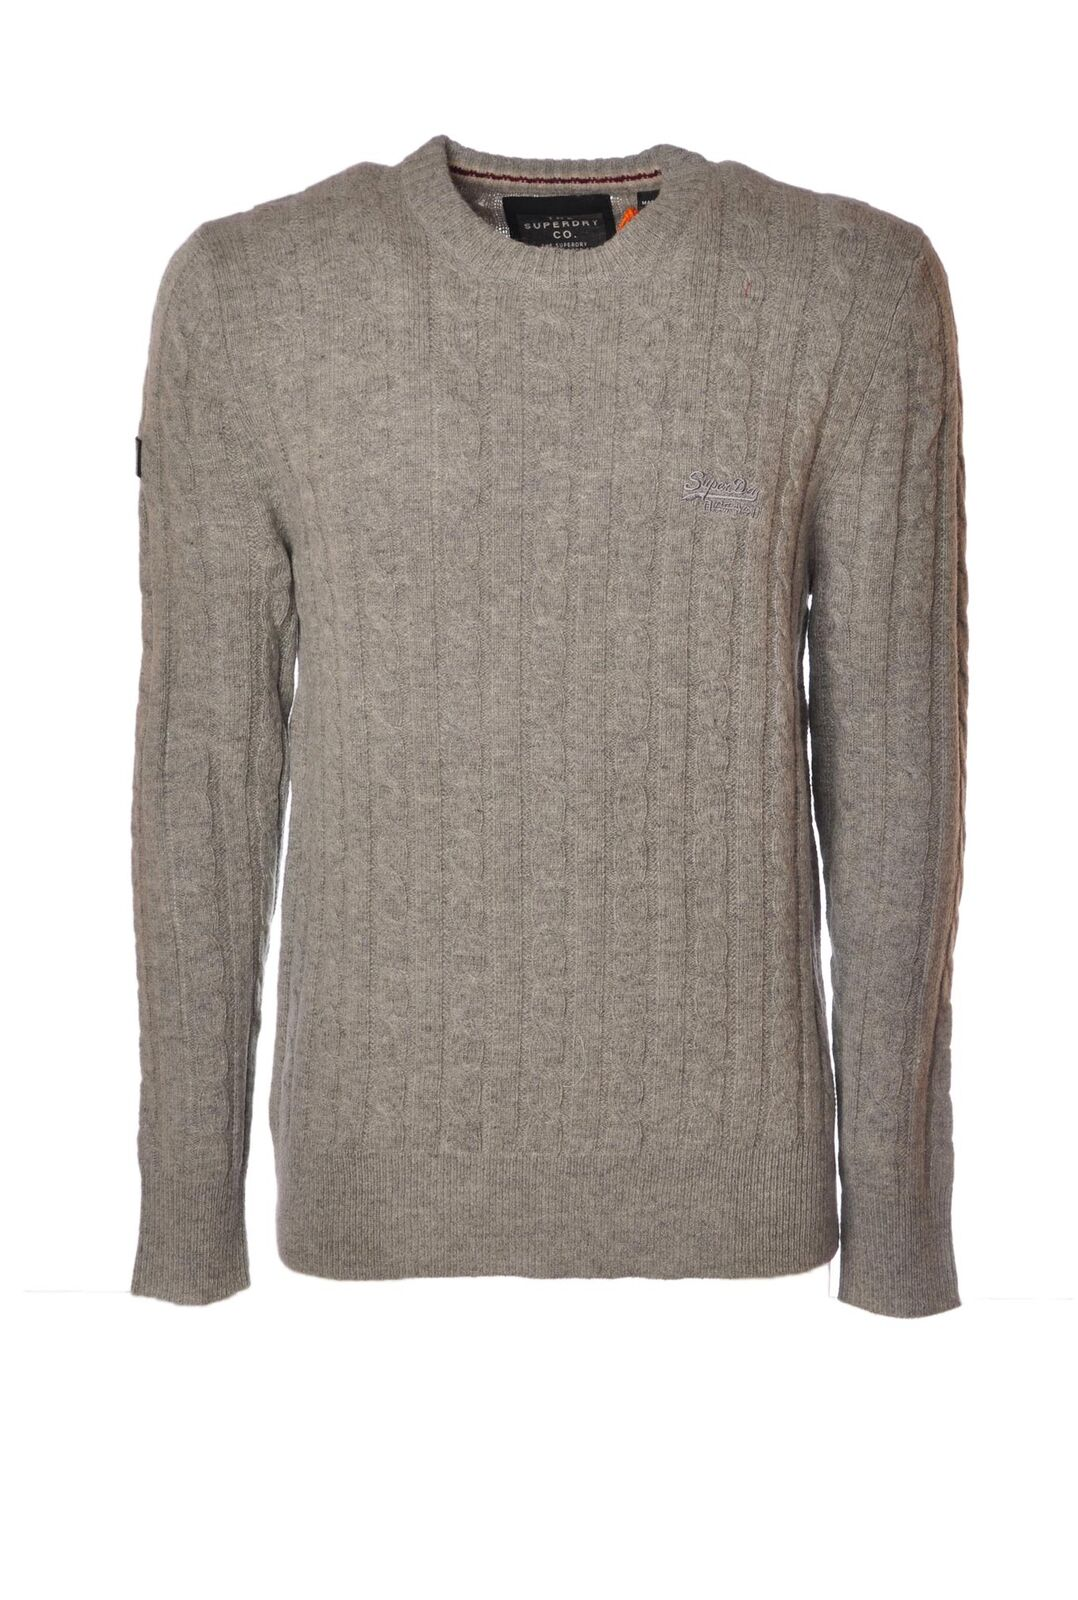 Superdry  -  Pullover - Männchen - Grau - 4348126A184450